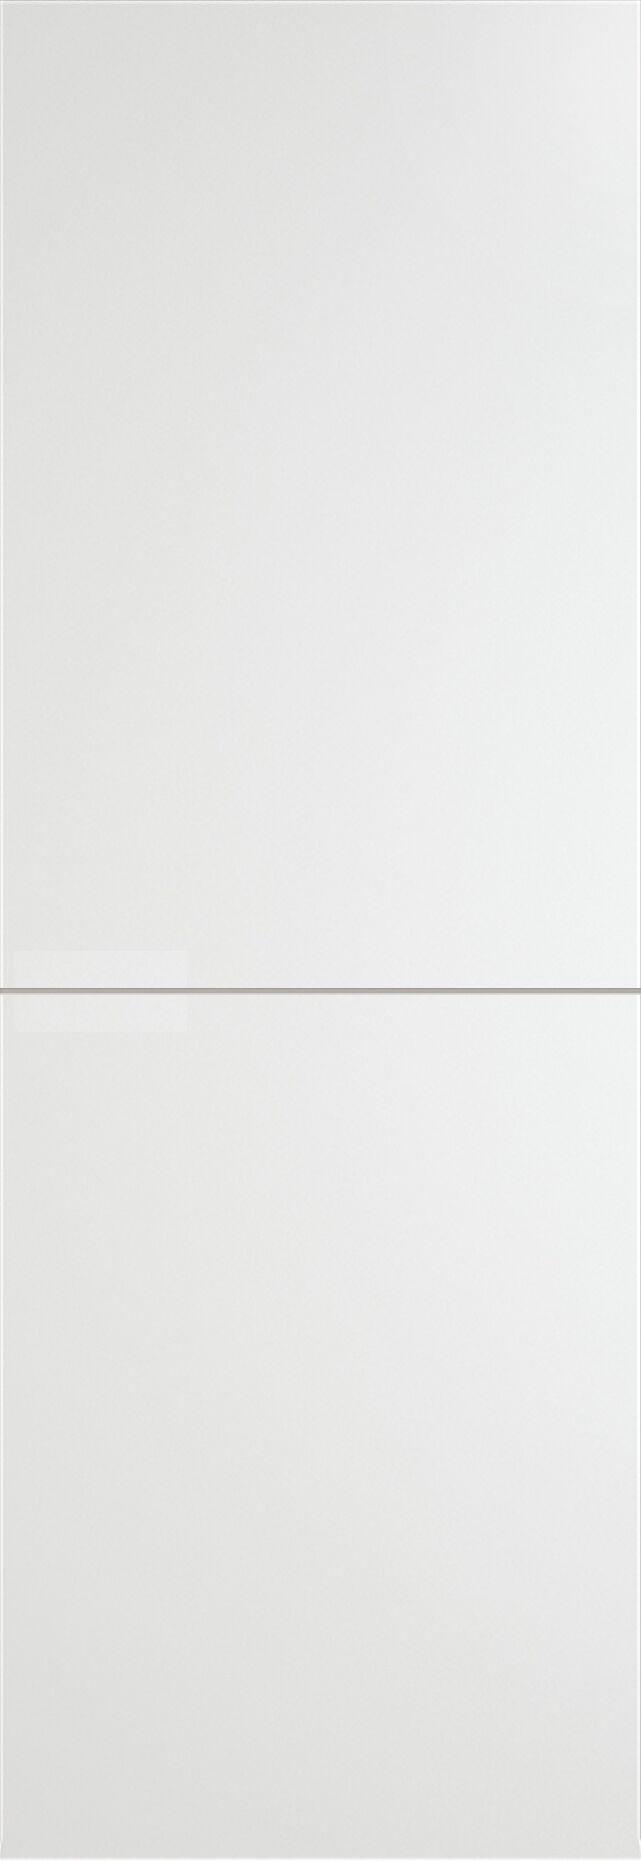 Tivoli Б-2 Invisible цвет - Белая эмаль Без стекла (ДГ)